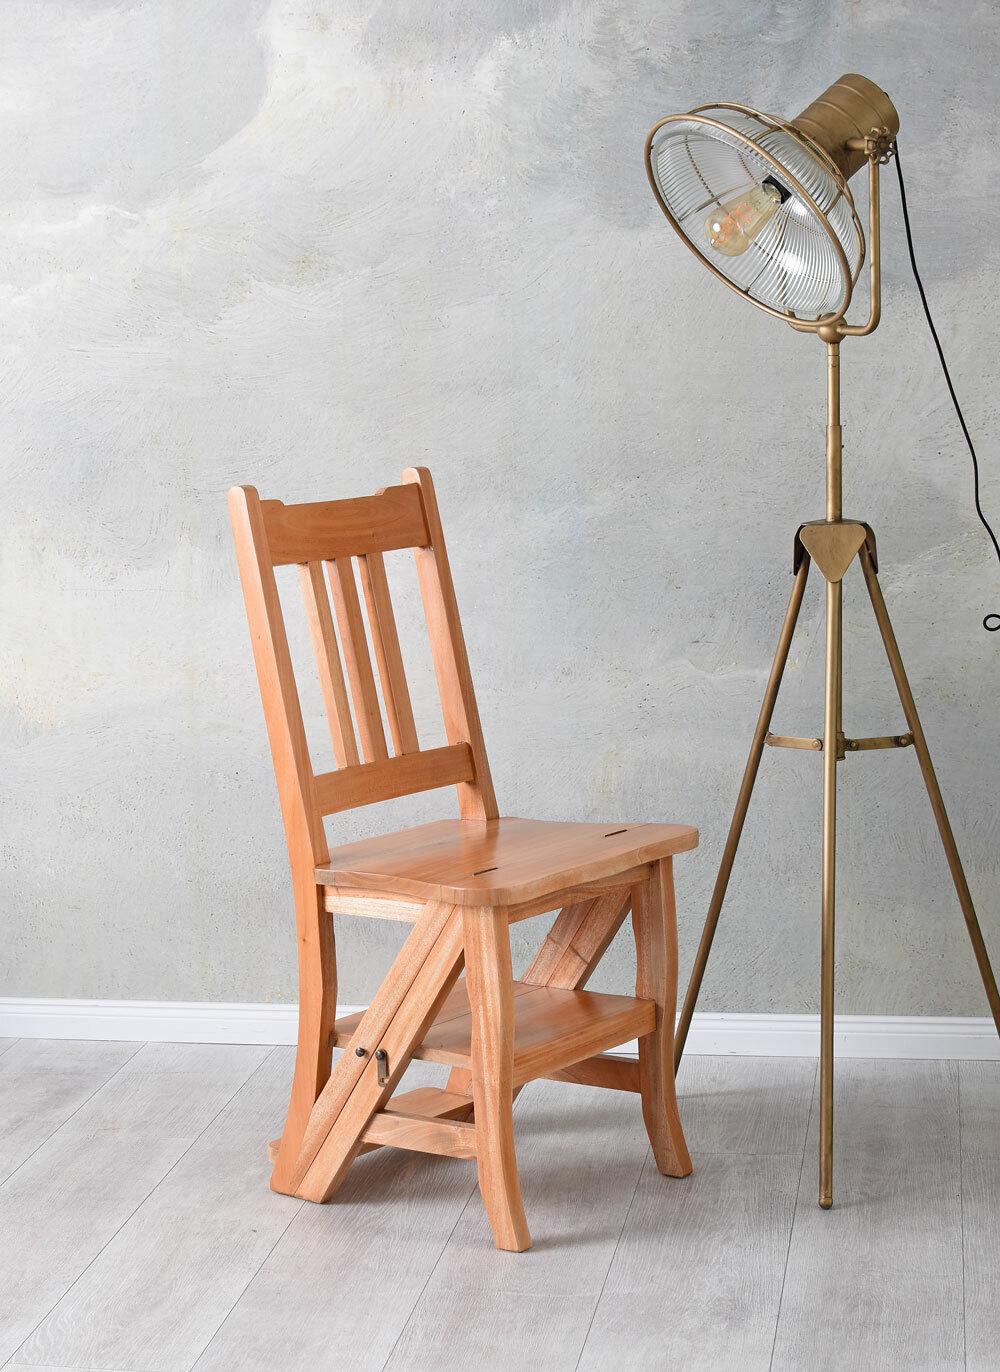 Step Stool Director Chair Solid Wood Bibliotheksstuhl Chair/